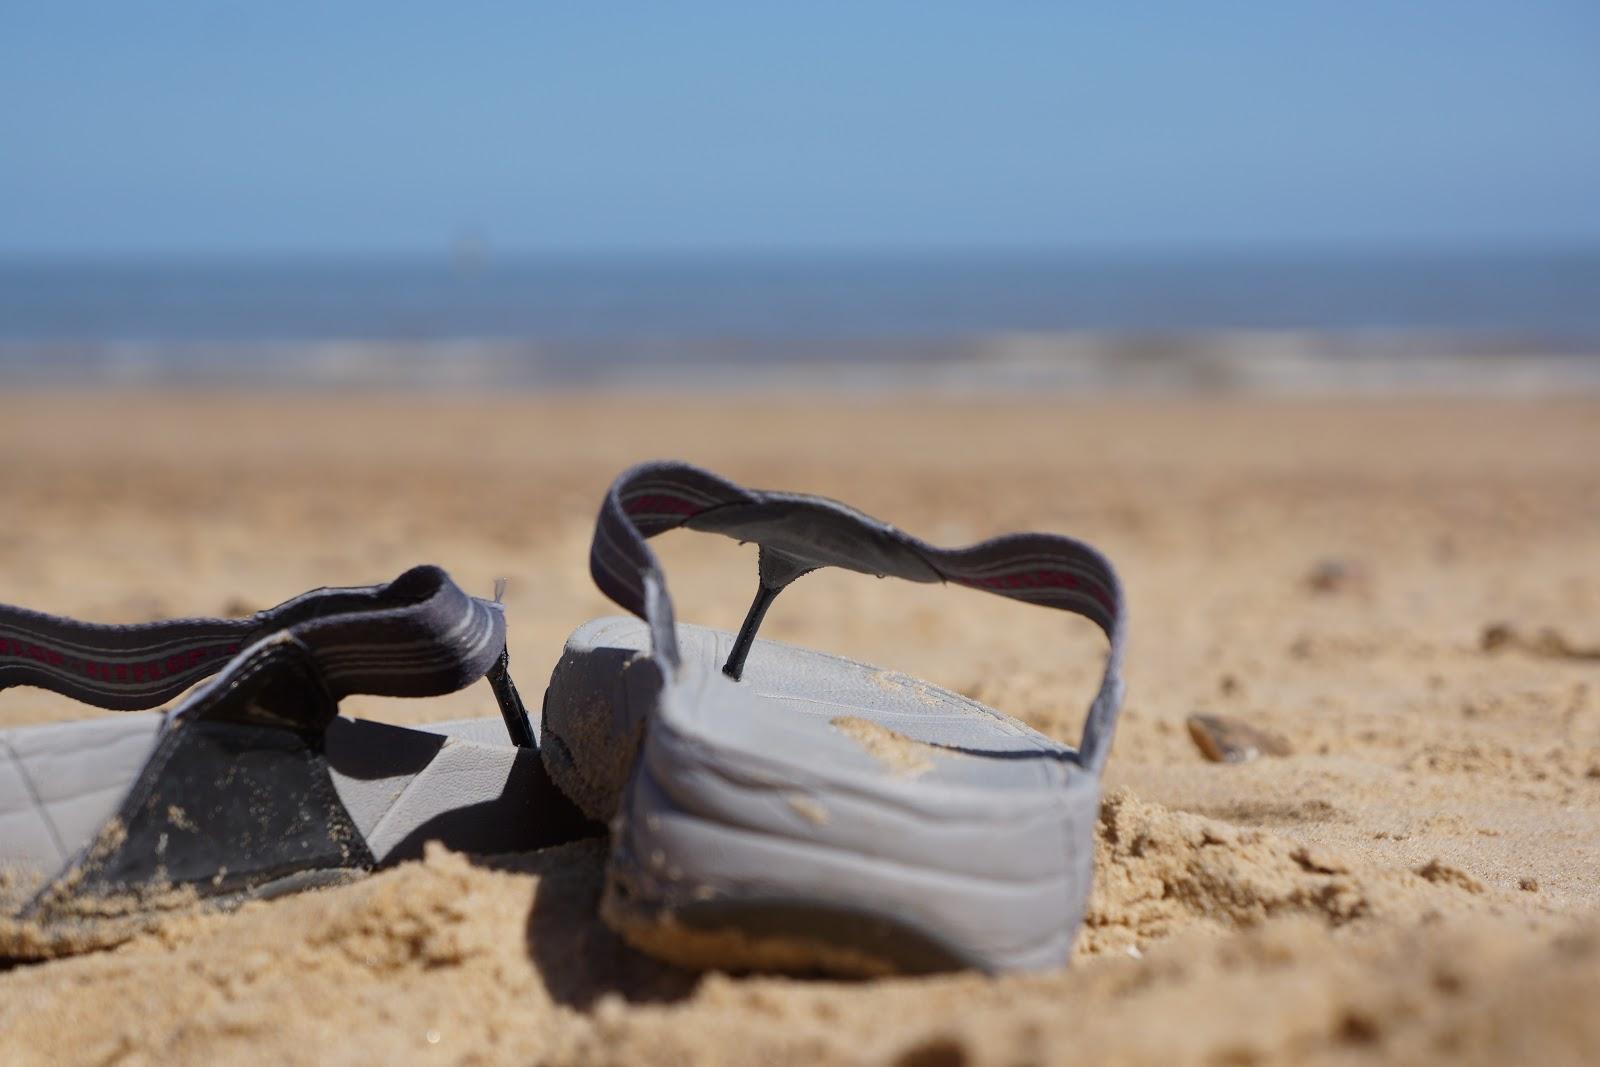 fit flops on sandy beach